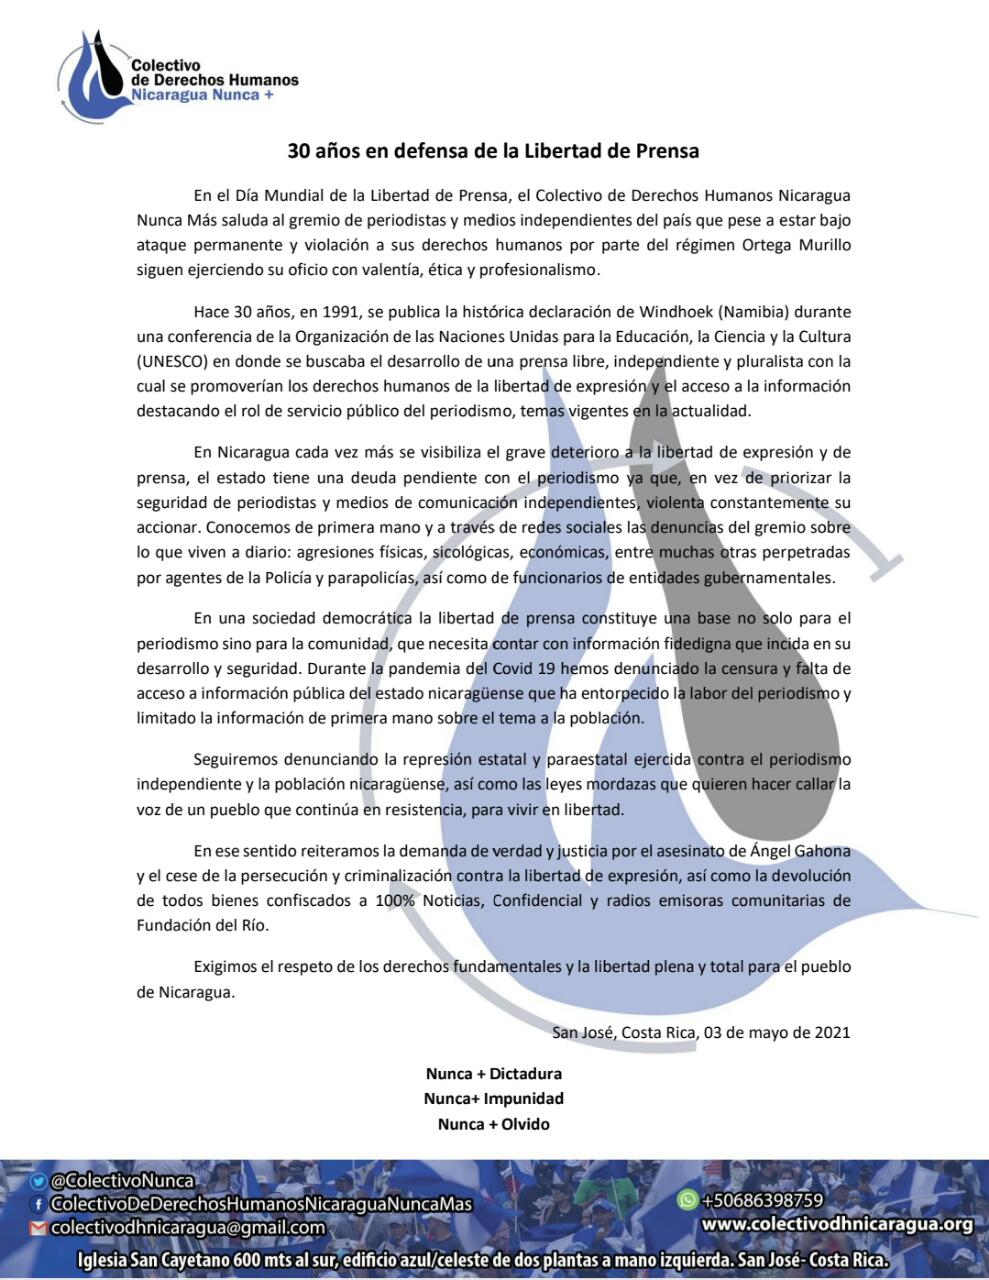 030521 Dia Mundial de la Libertad de Prensa